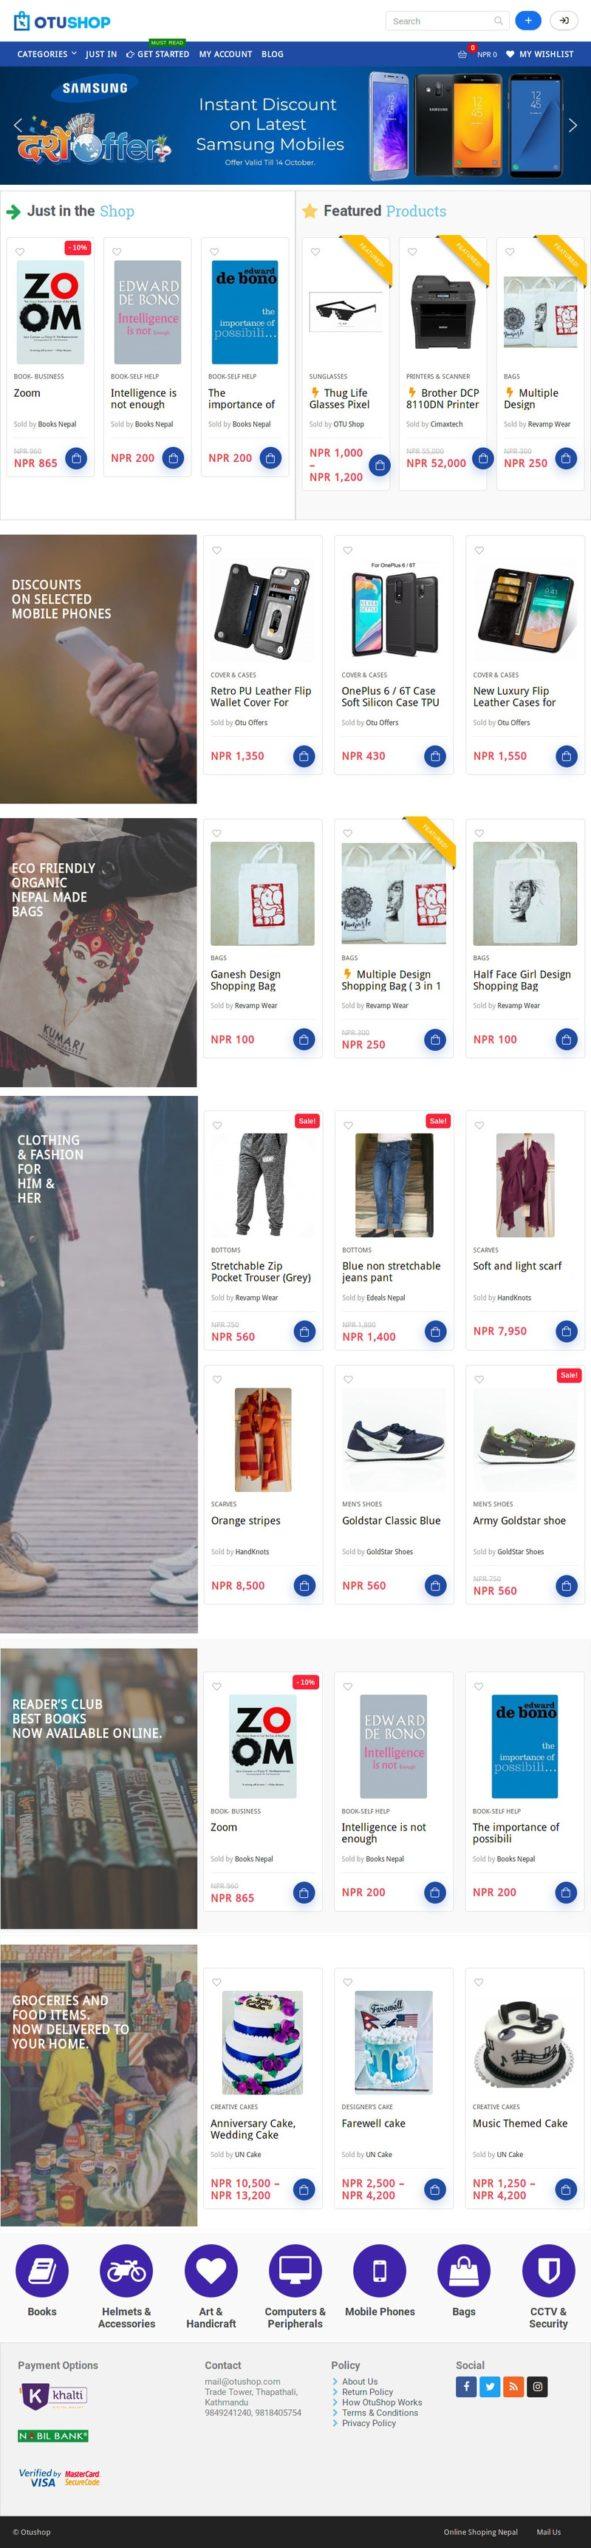 OtuShop.com - eCommerce website 1